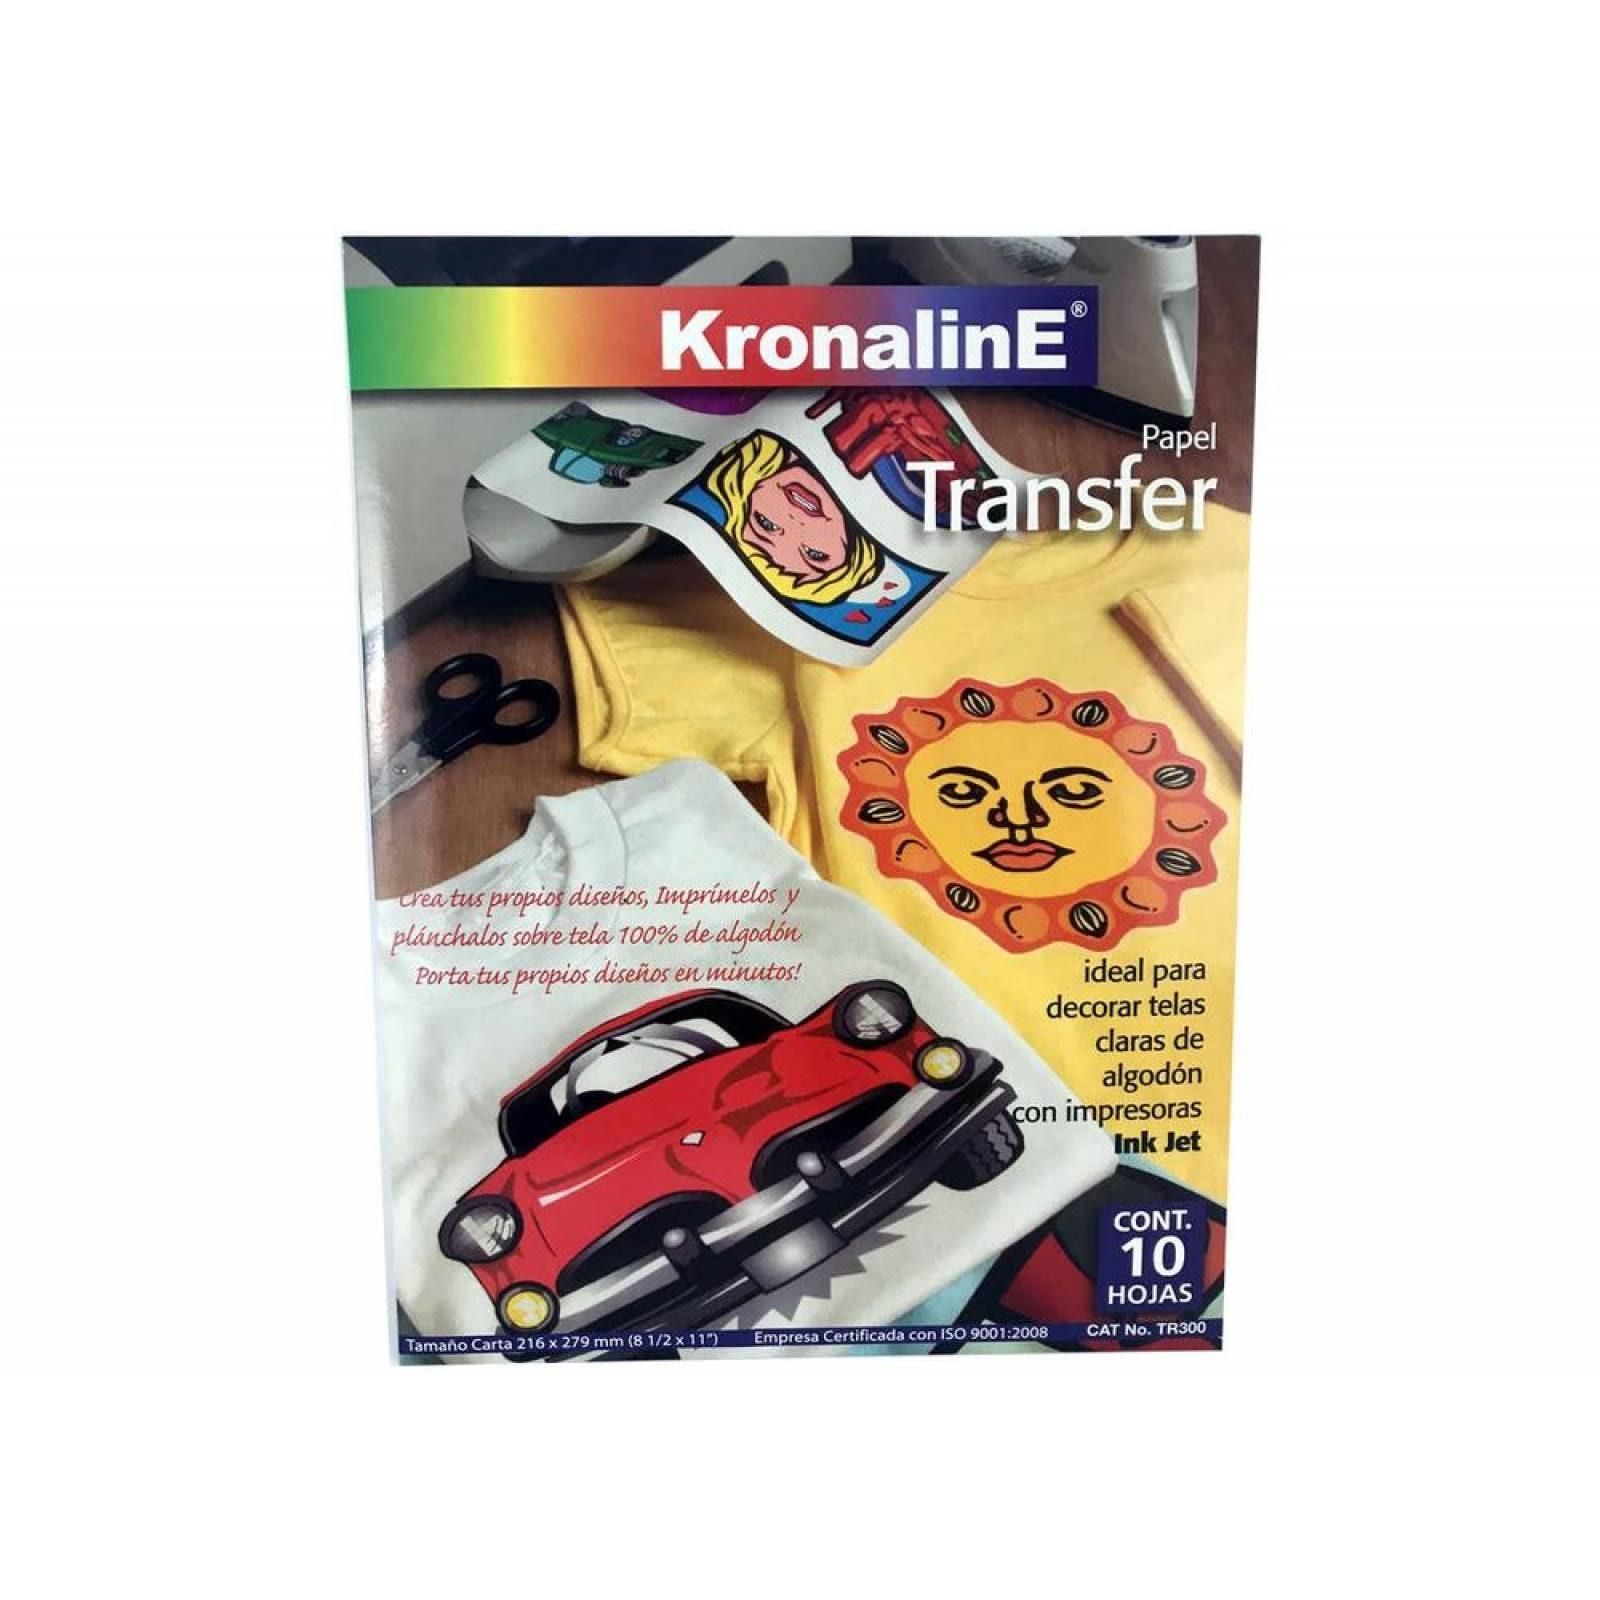 Papel Transfer KronalinE Tr305 10h Carta Tela obscura inkjet